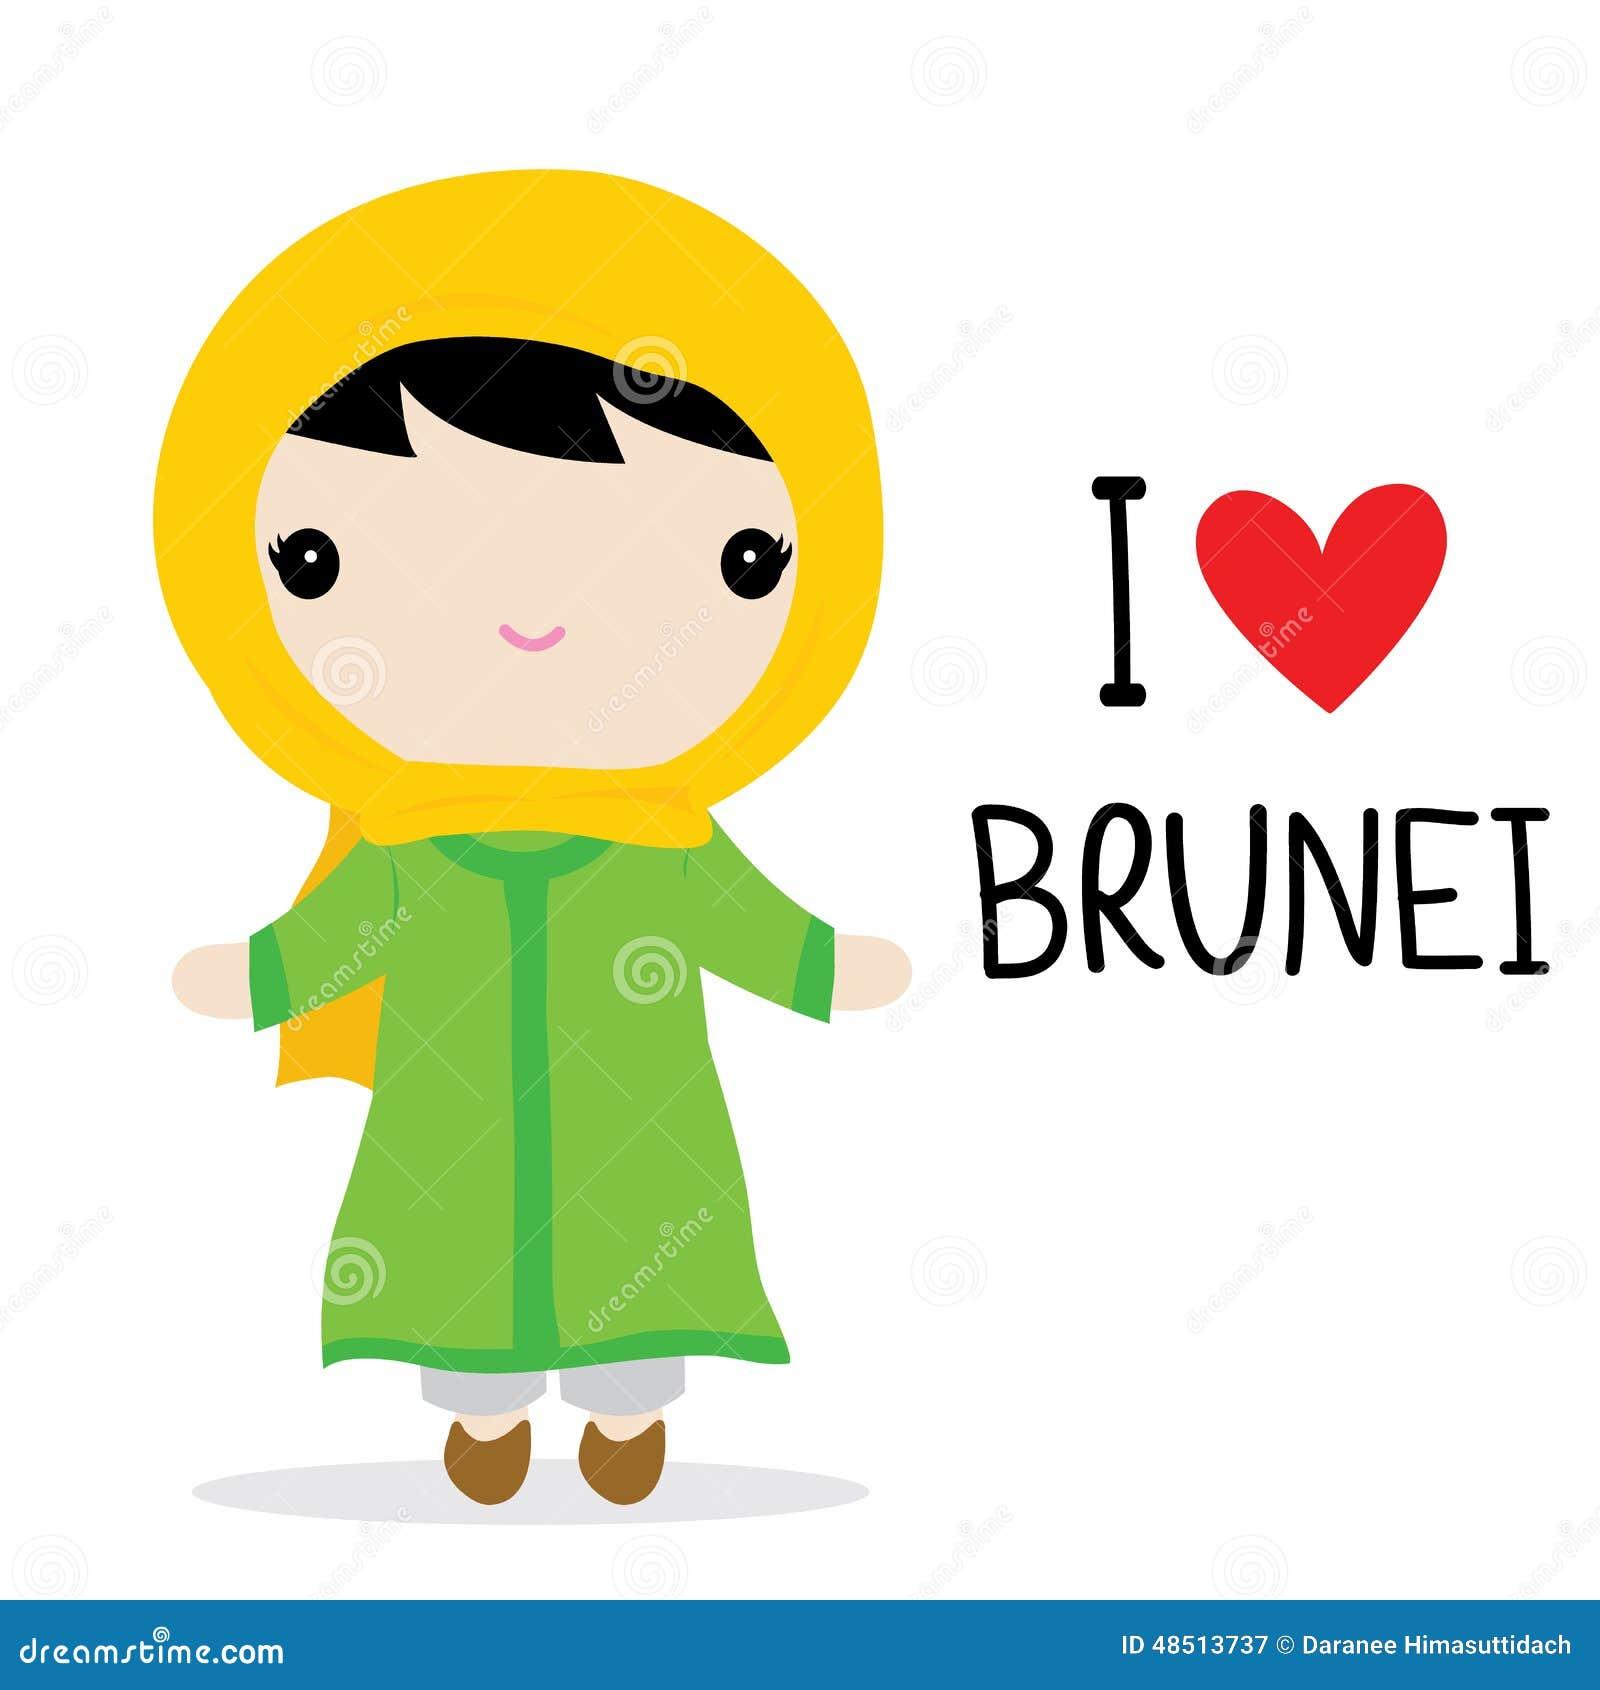 Brunei Women National Dress Cartoon Vector Stock Vector - Image: 48513737 X 23 Costume